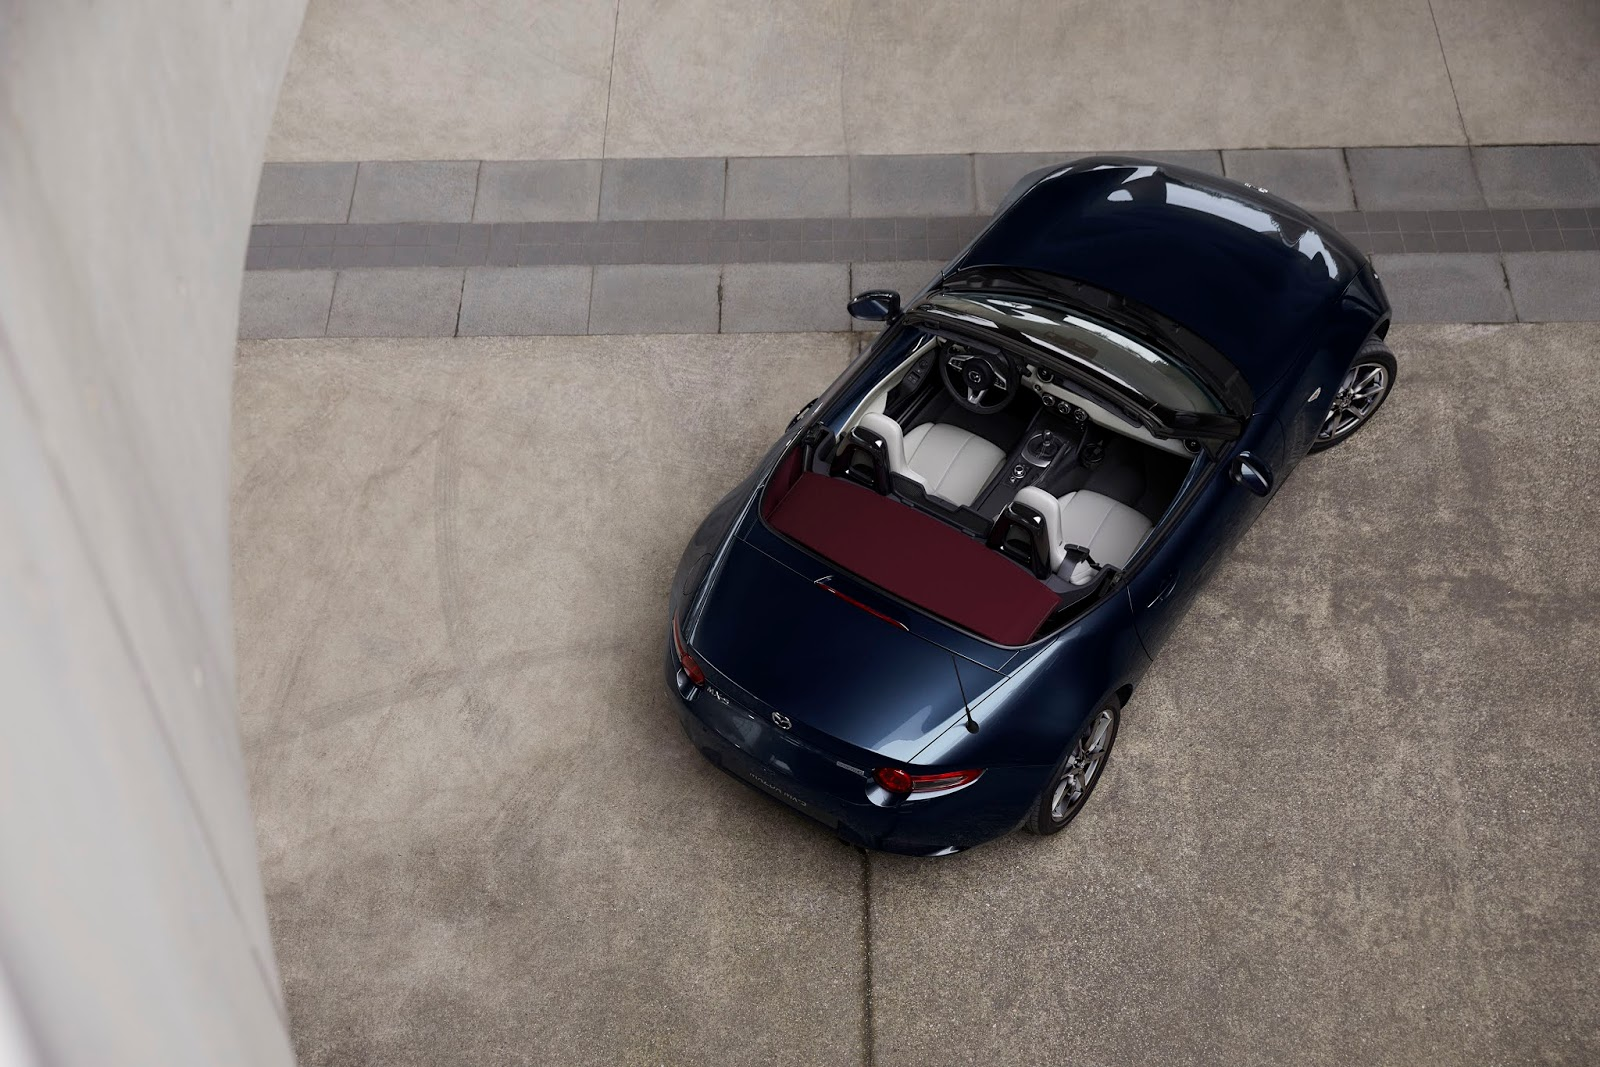 2021 Mazda MX 5 Exterior 05 16 MAZDA MX-5 : Το θρυλικό roadster γίνεται ακόμα καλύτερο